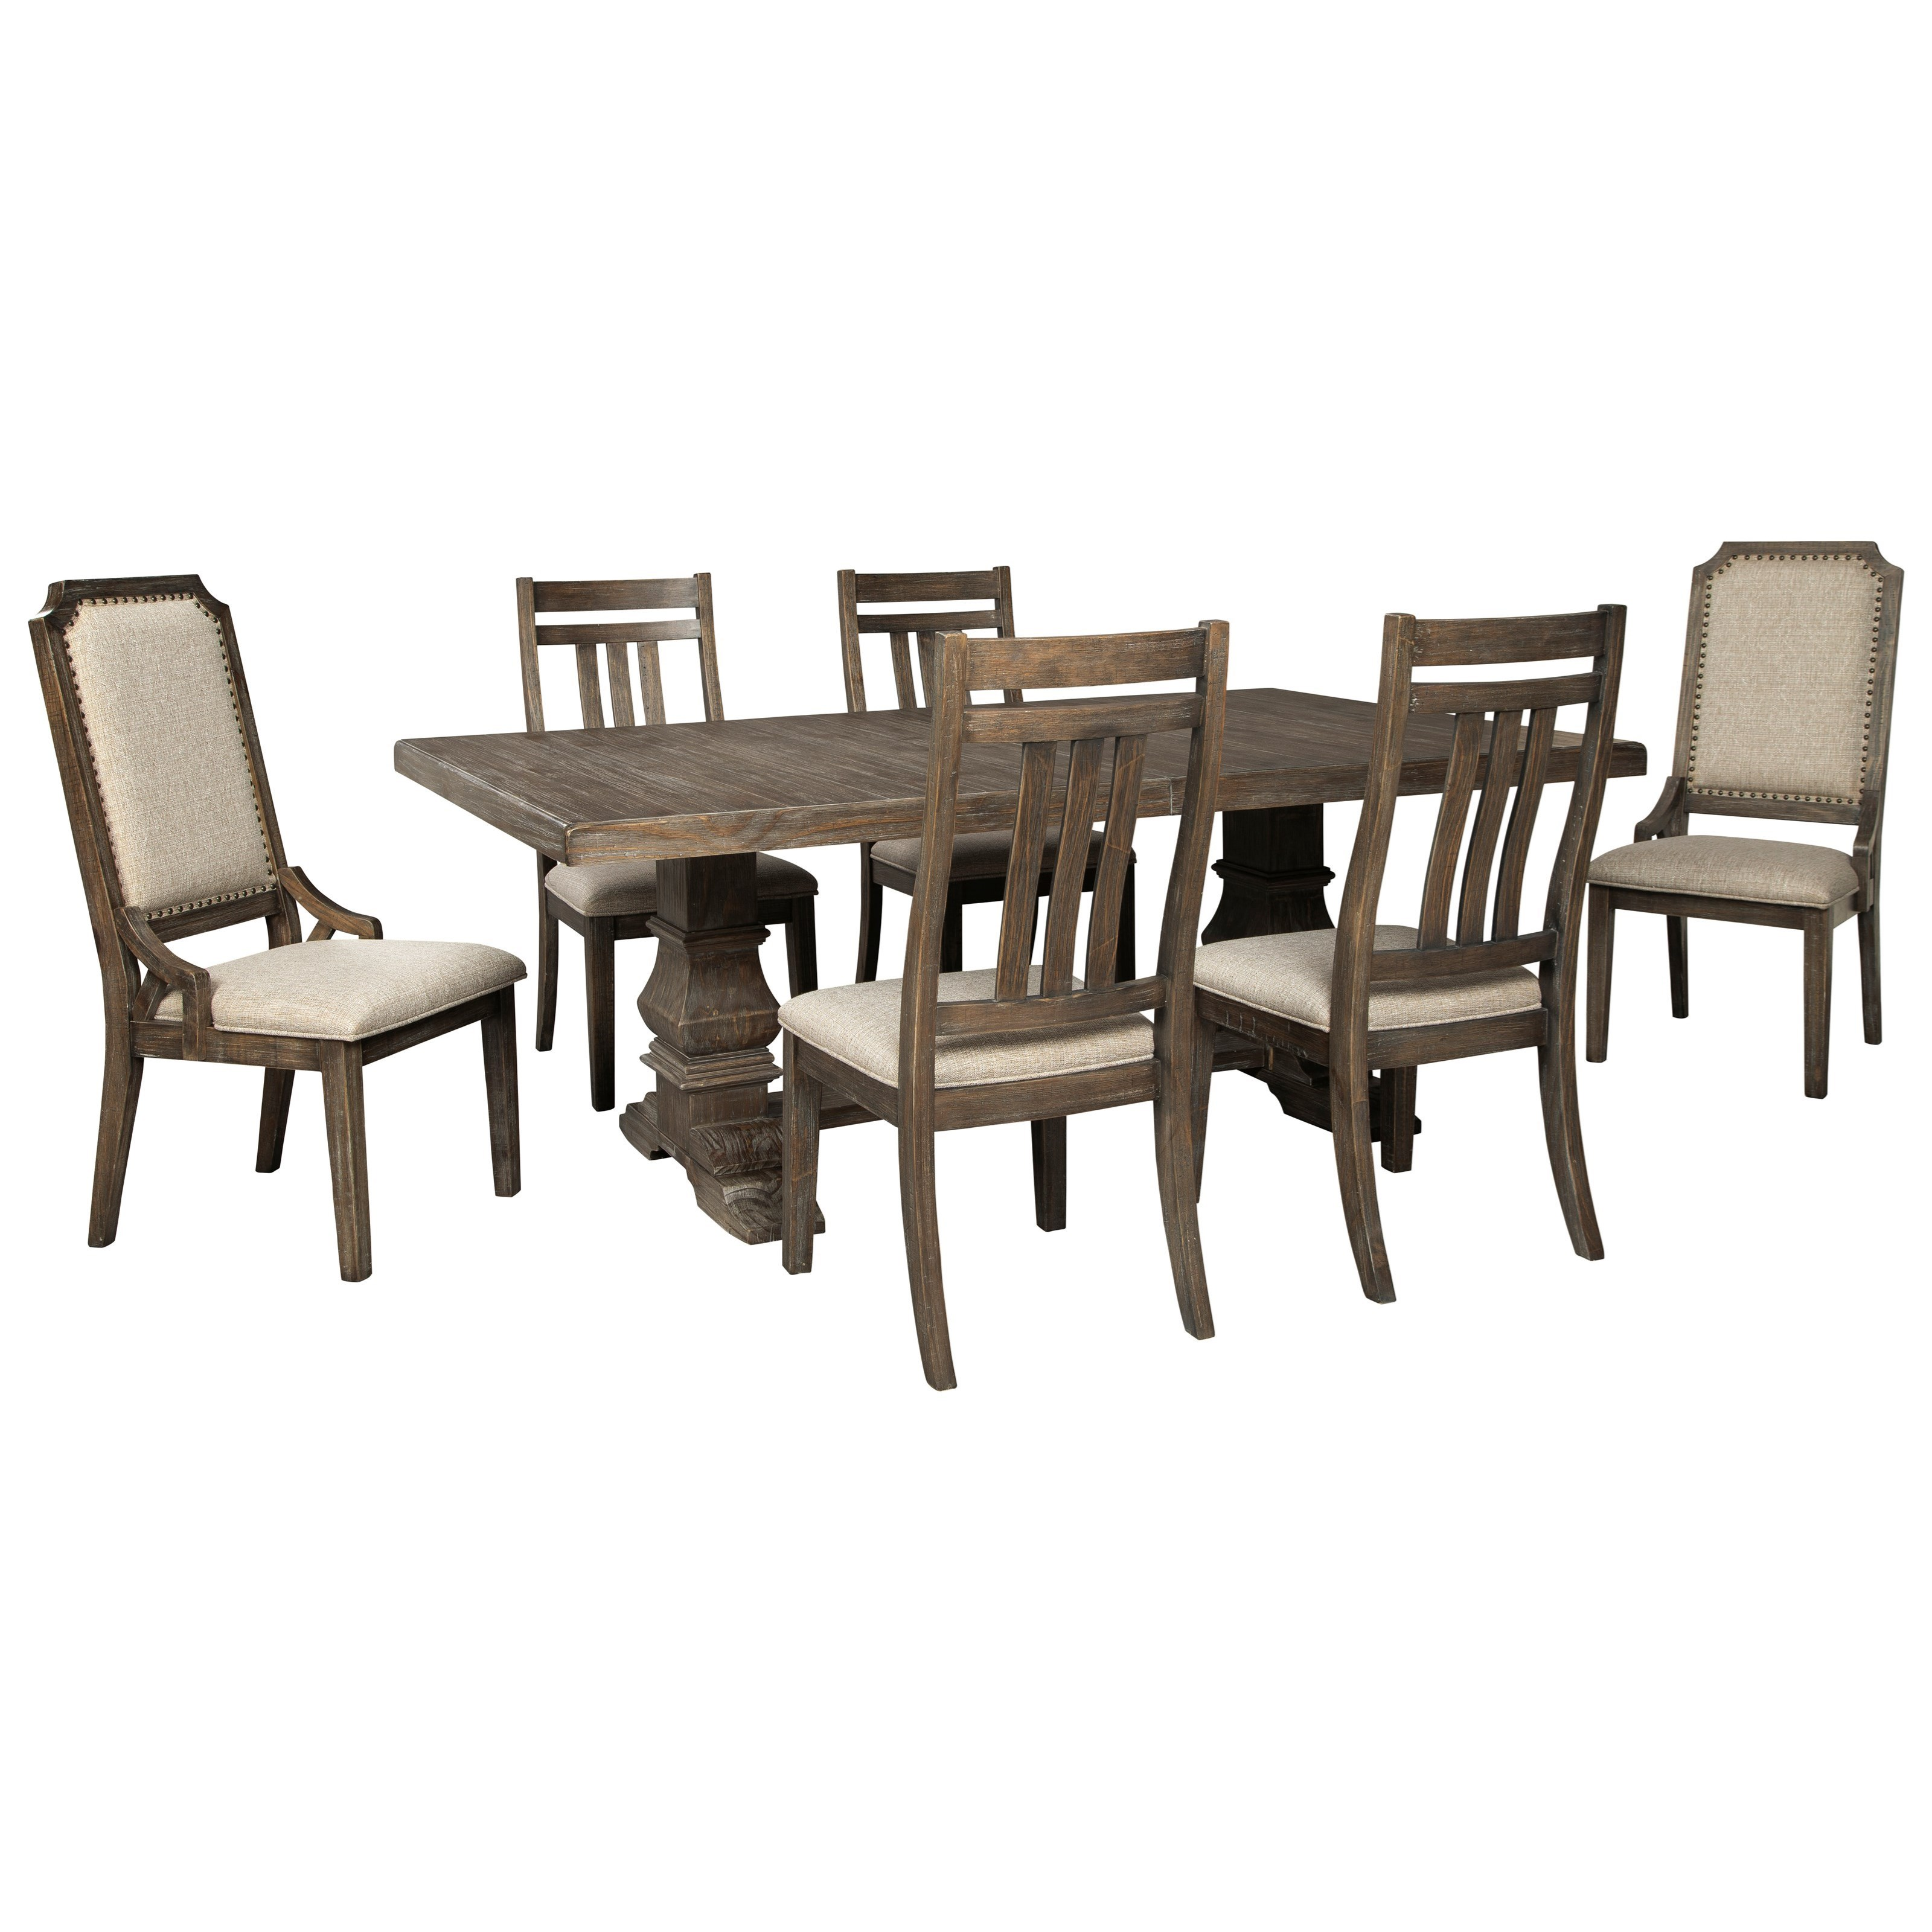 Wyndahl 7-Piece Dining Table Set by Ashley (Signature Design) at Johnny Janosik